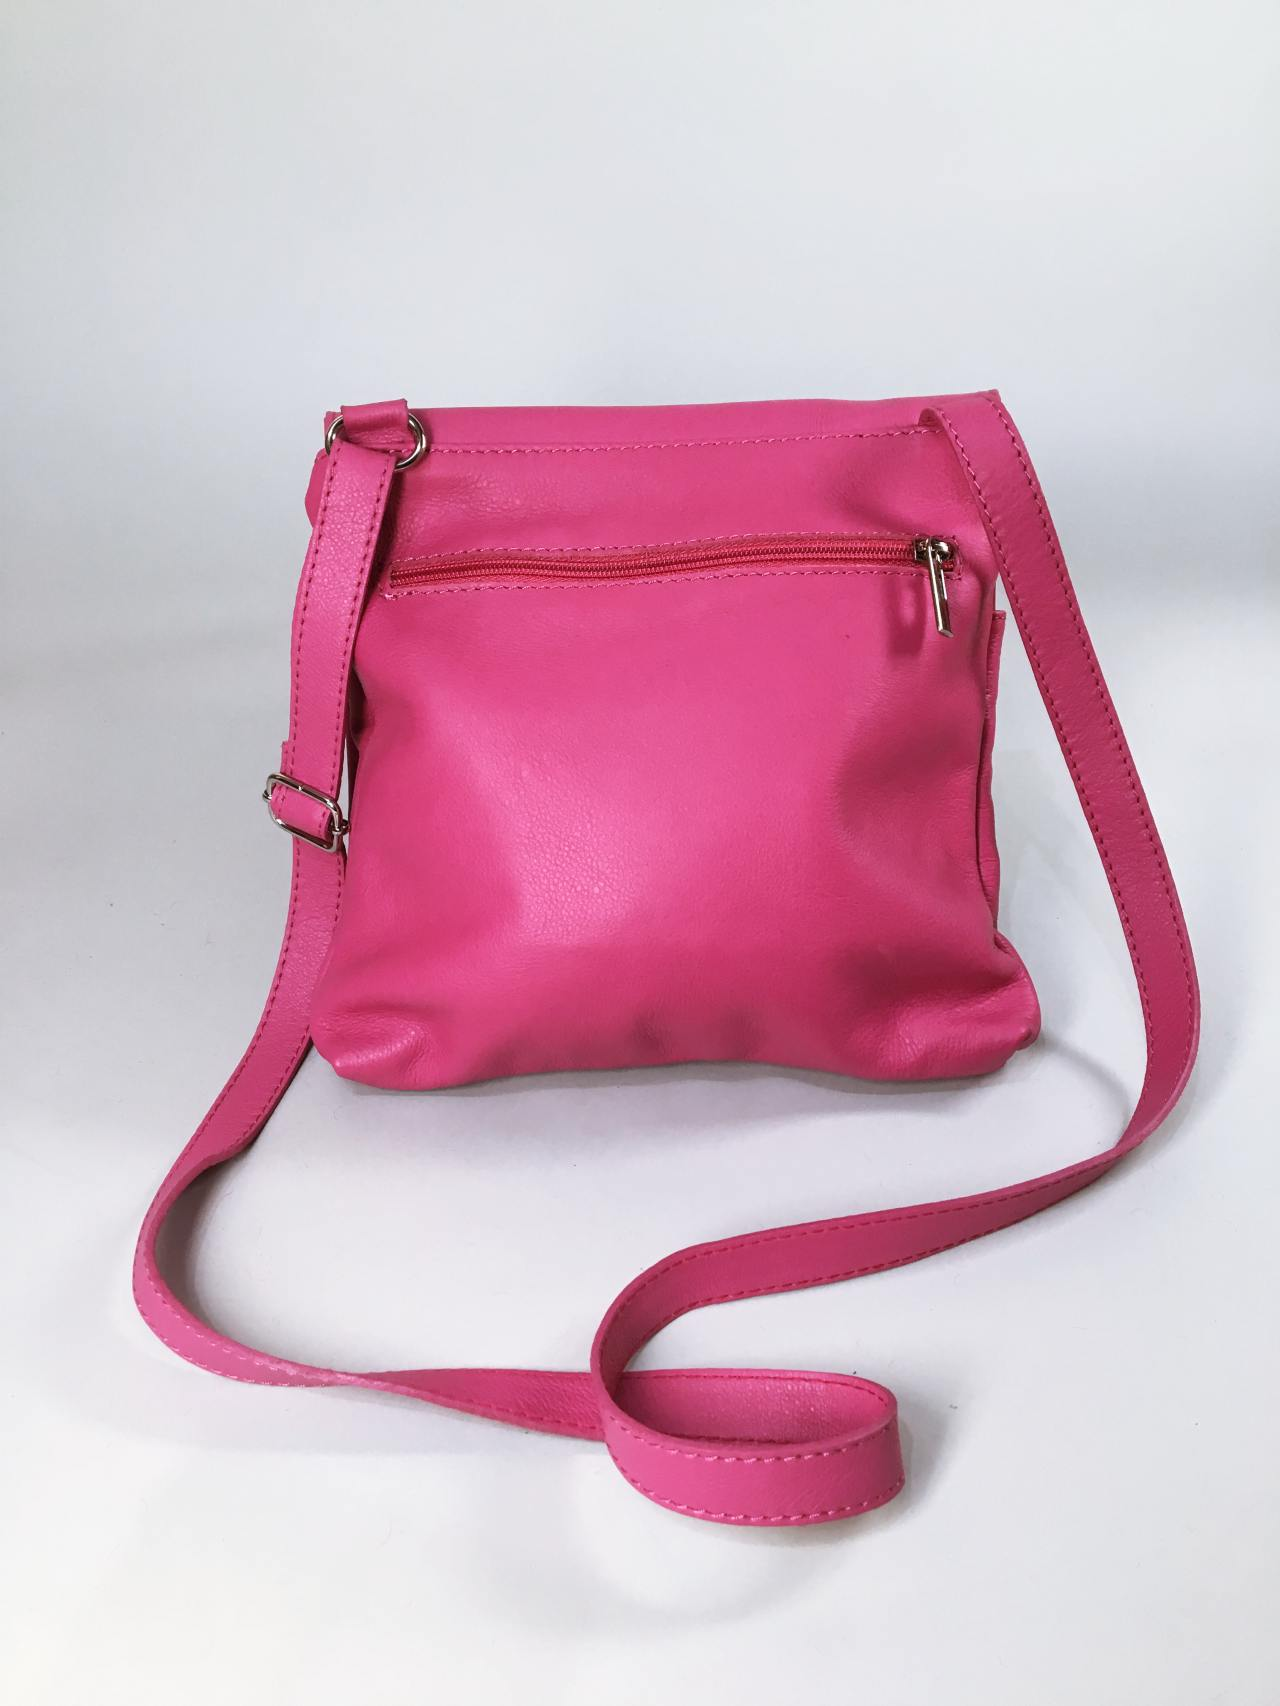 Kožená kabelka Pink – Simm-Fashion.cz 95c65d8184